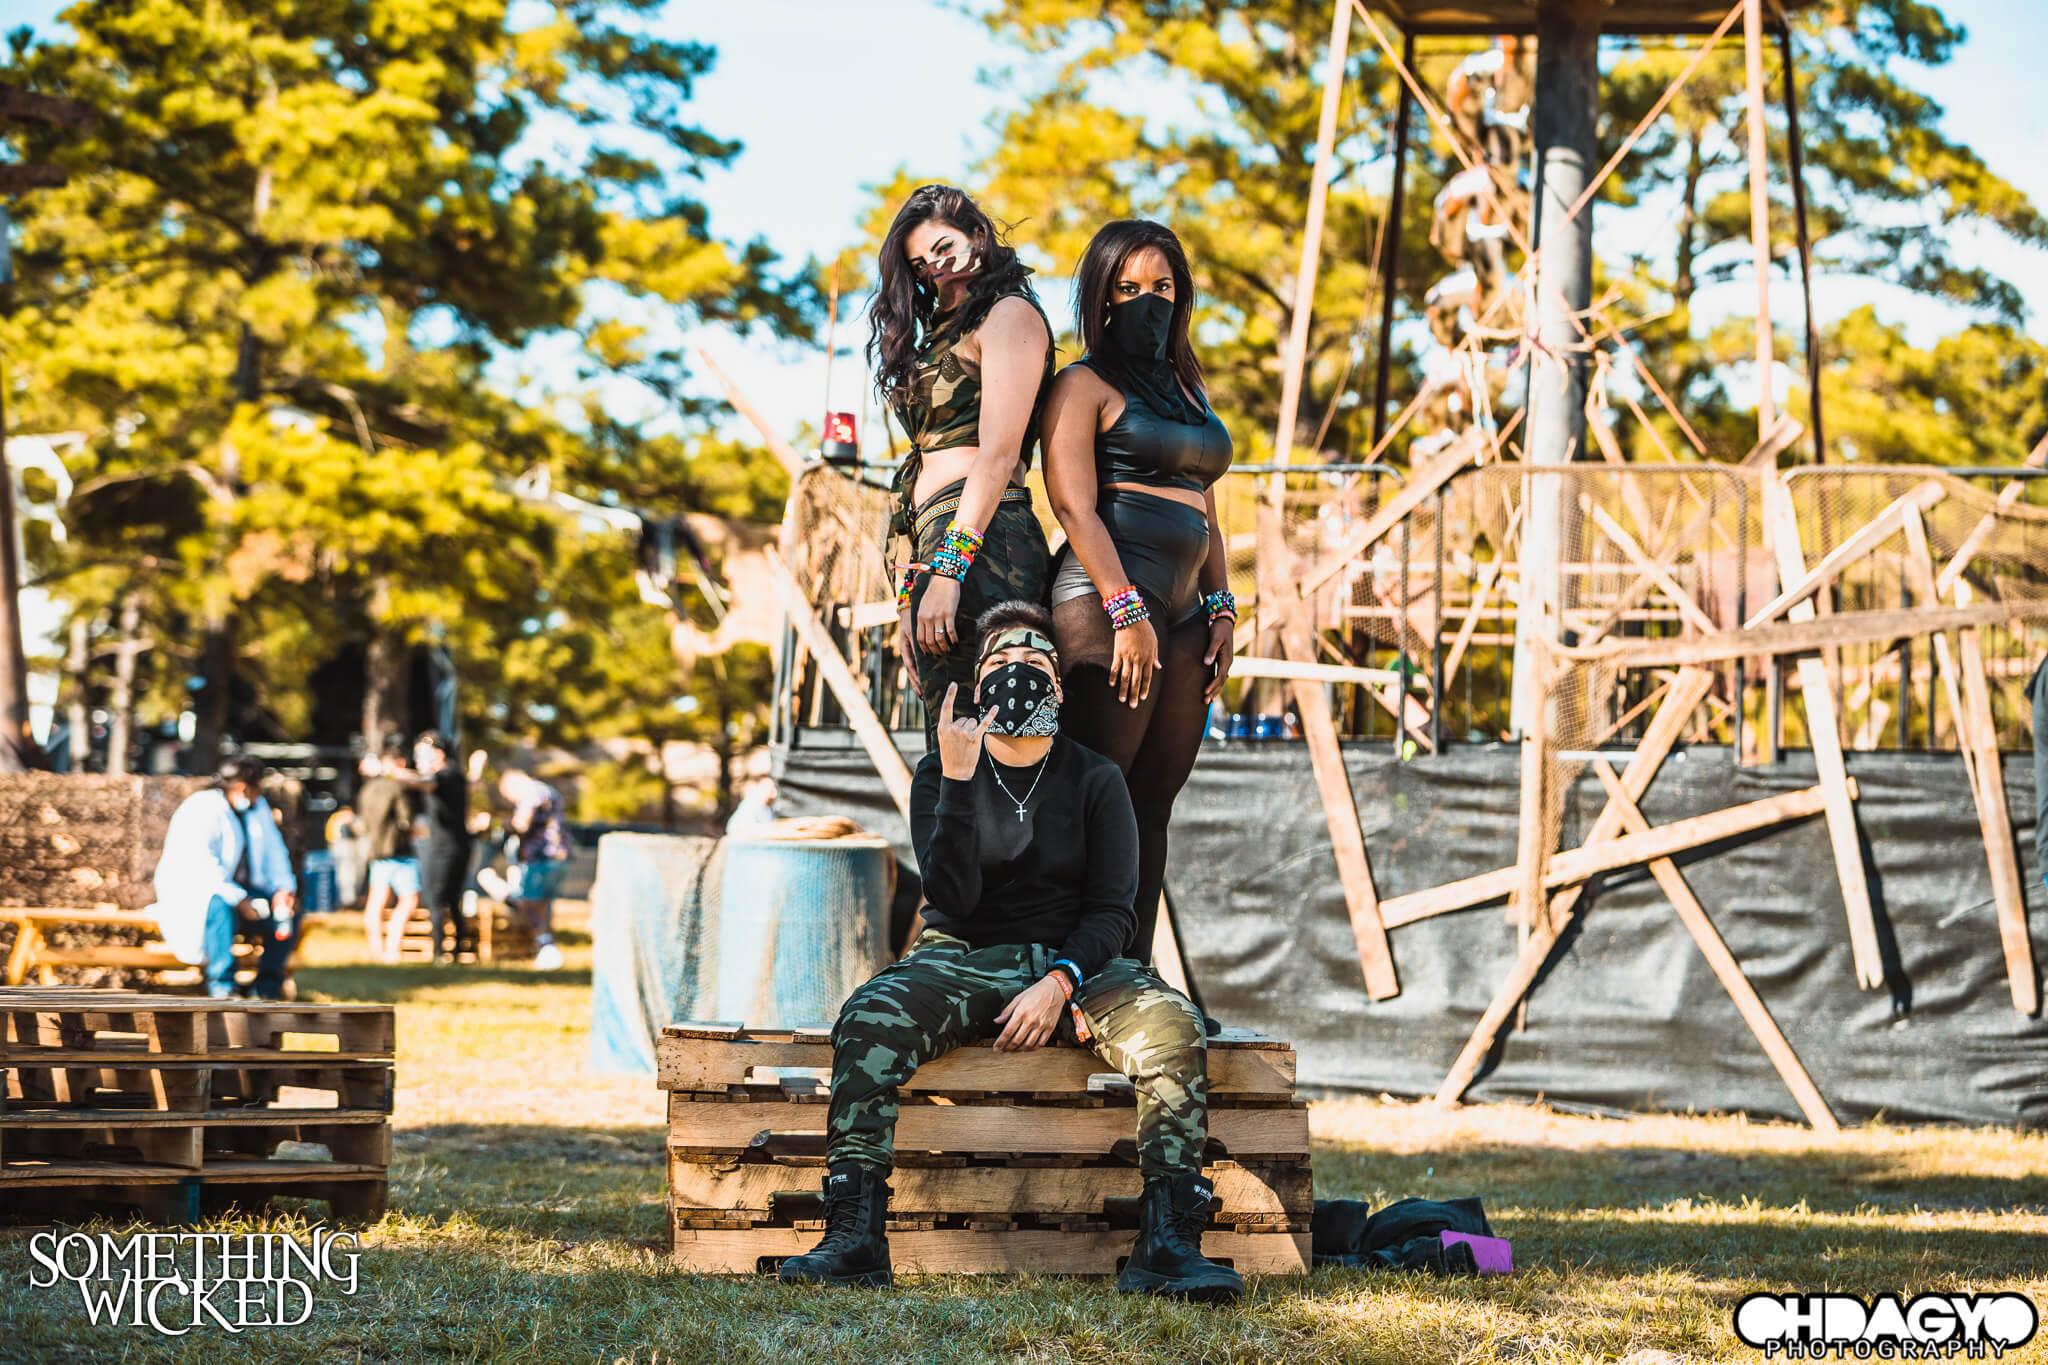 wicked crew of festival fans